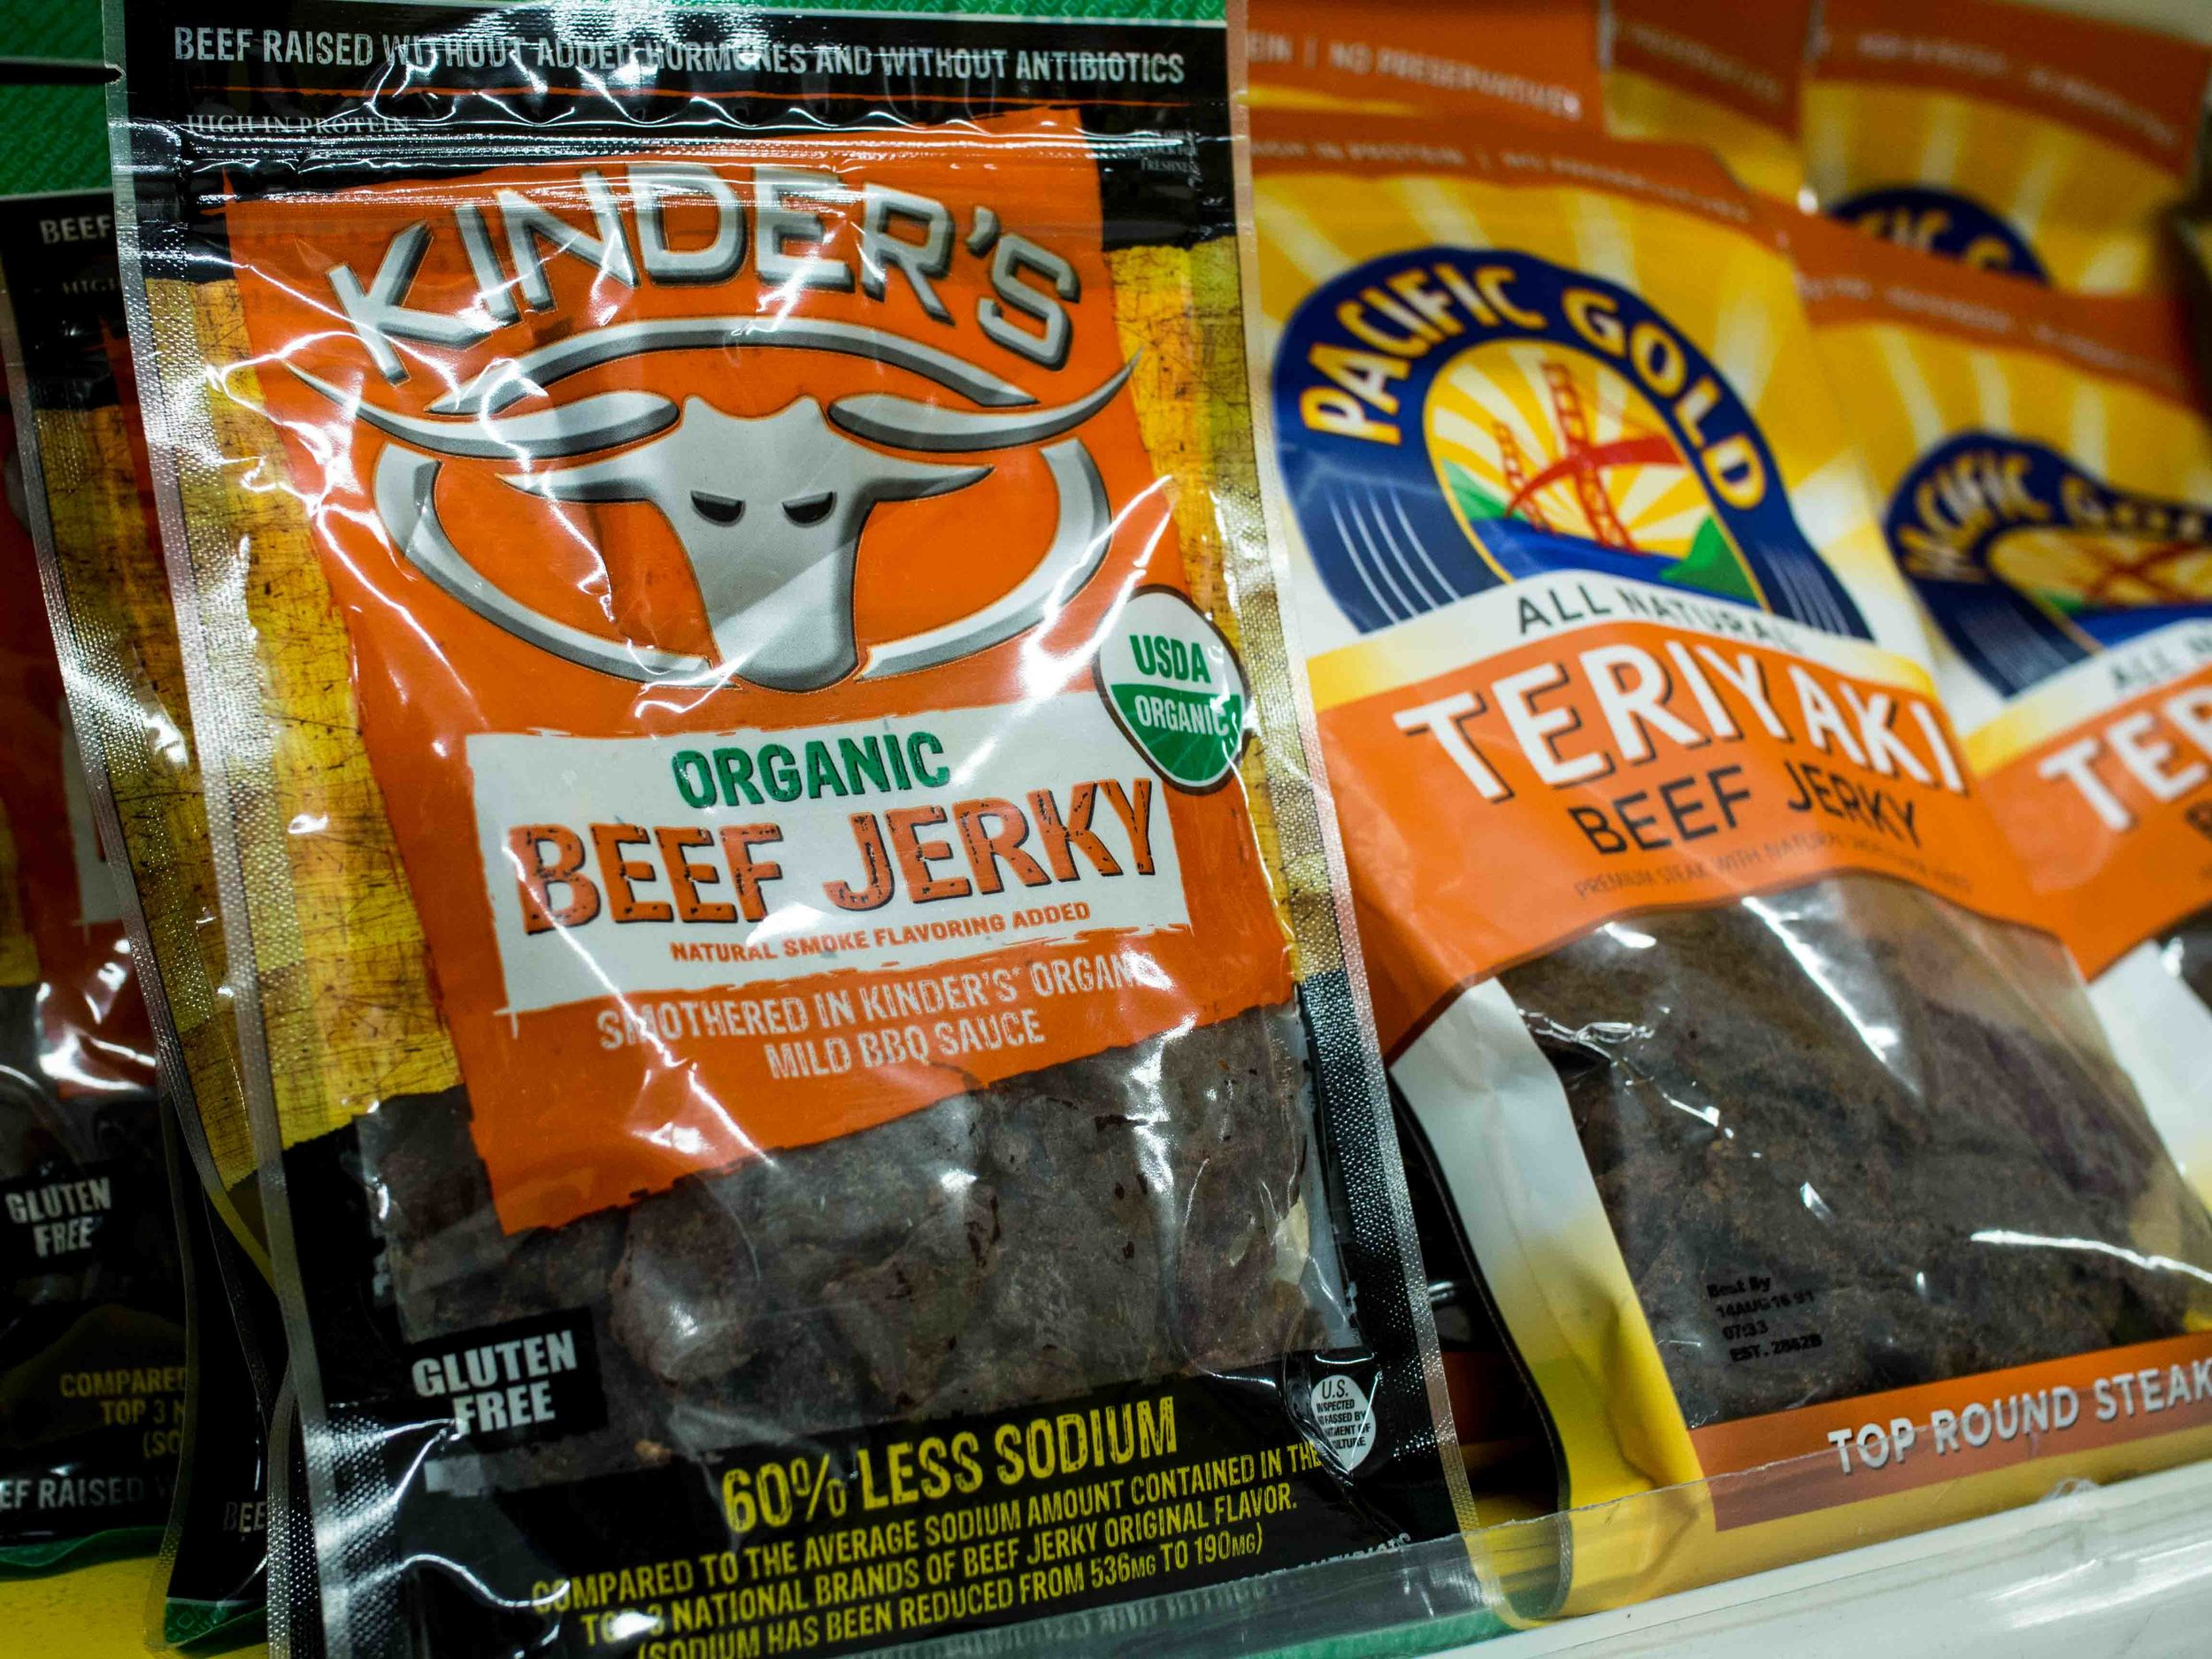 Kinders Organic Beef Jerky